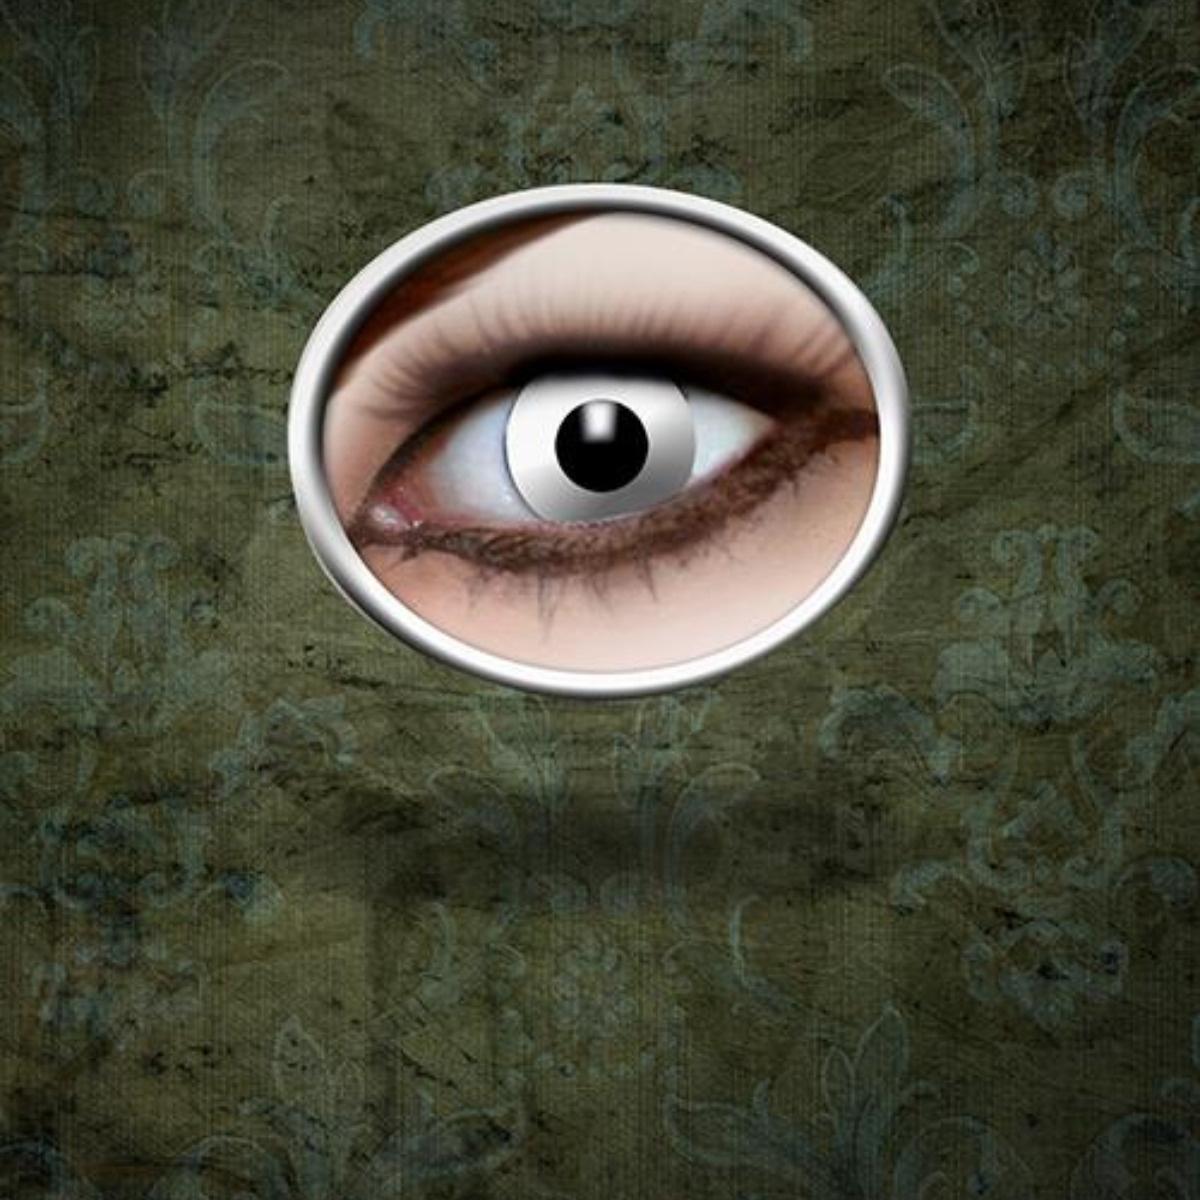 Contact lenses White Zombie